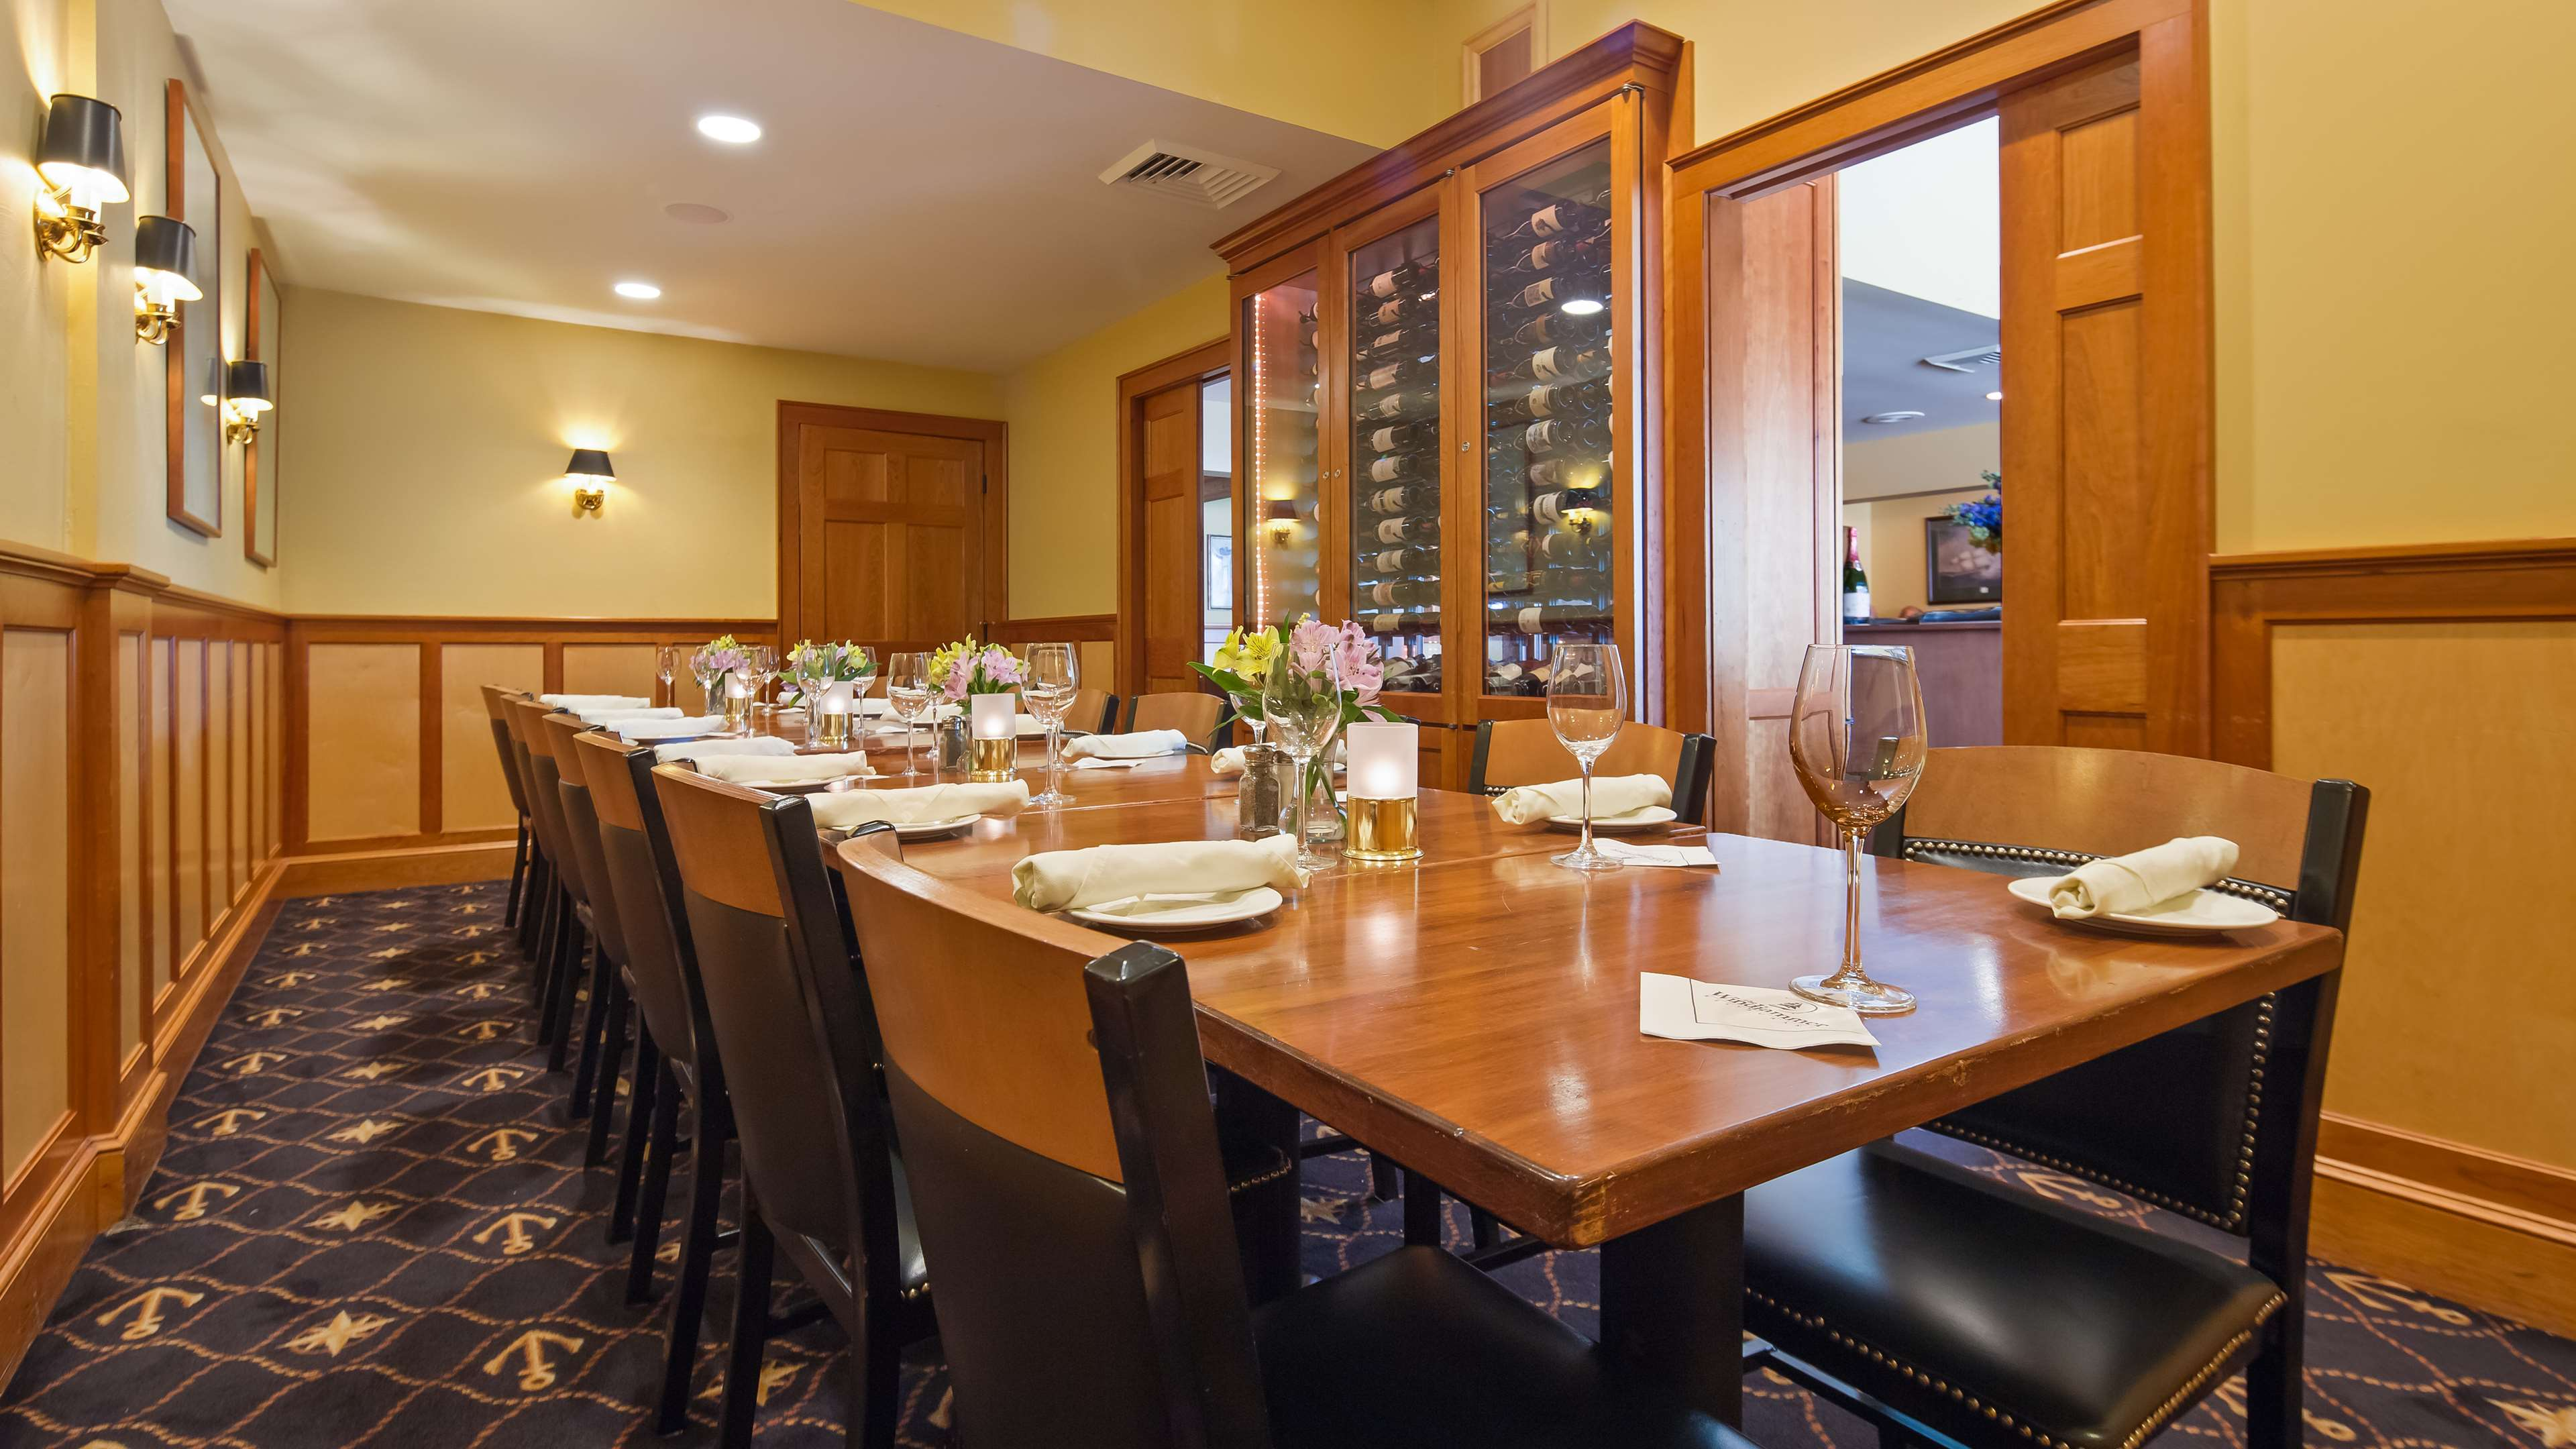 Best Western Plus Windjammer Inn & Conference Center image 8